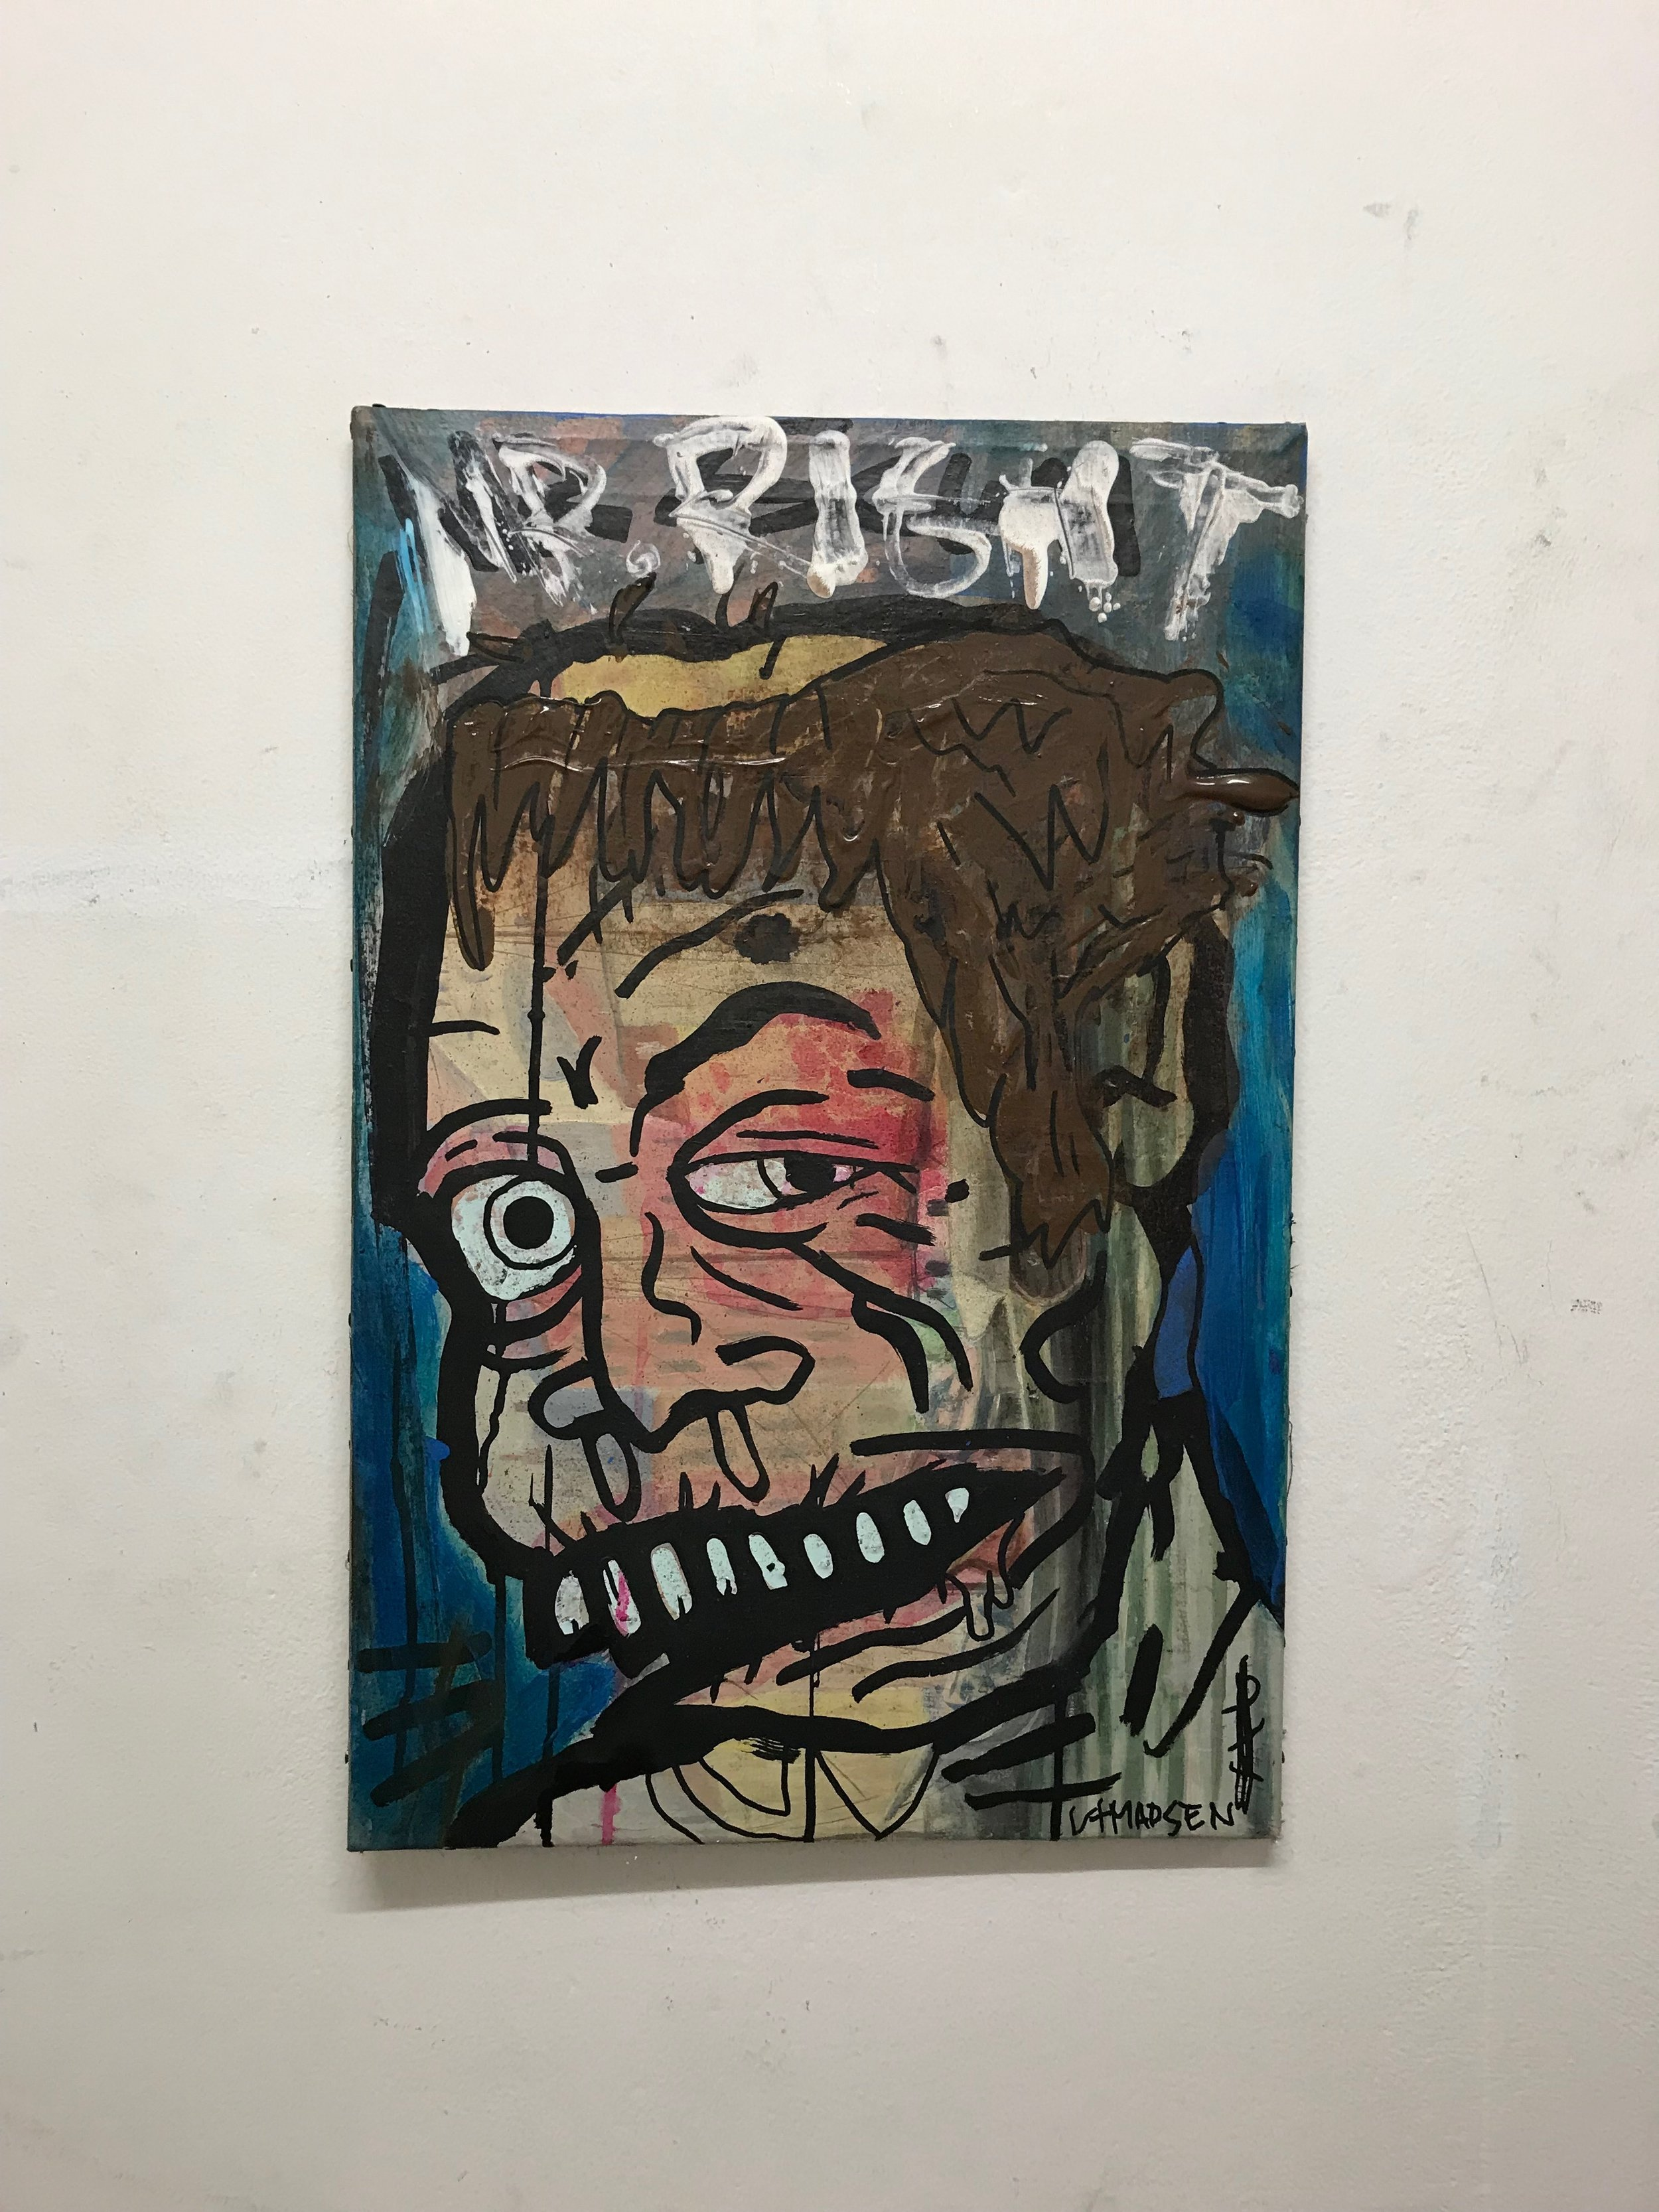 MR. Right 44 x 66 cm mixed media